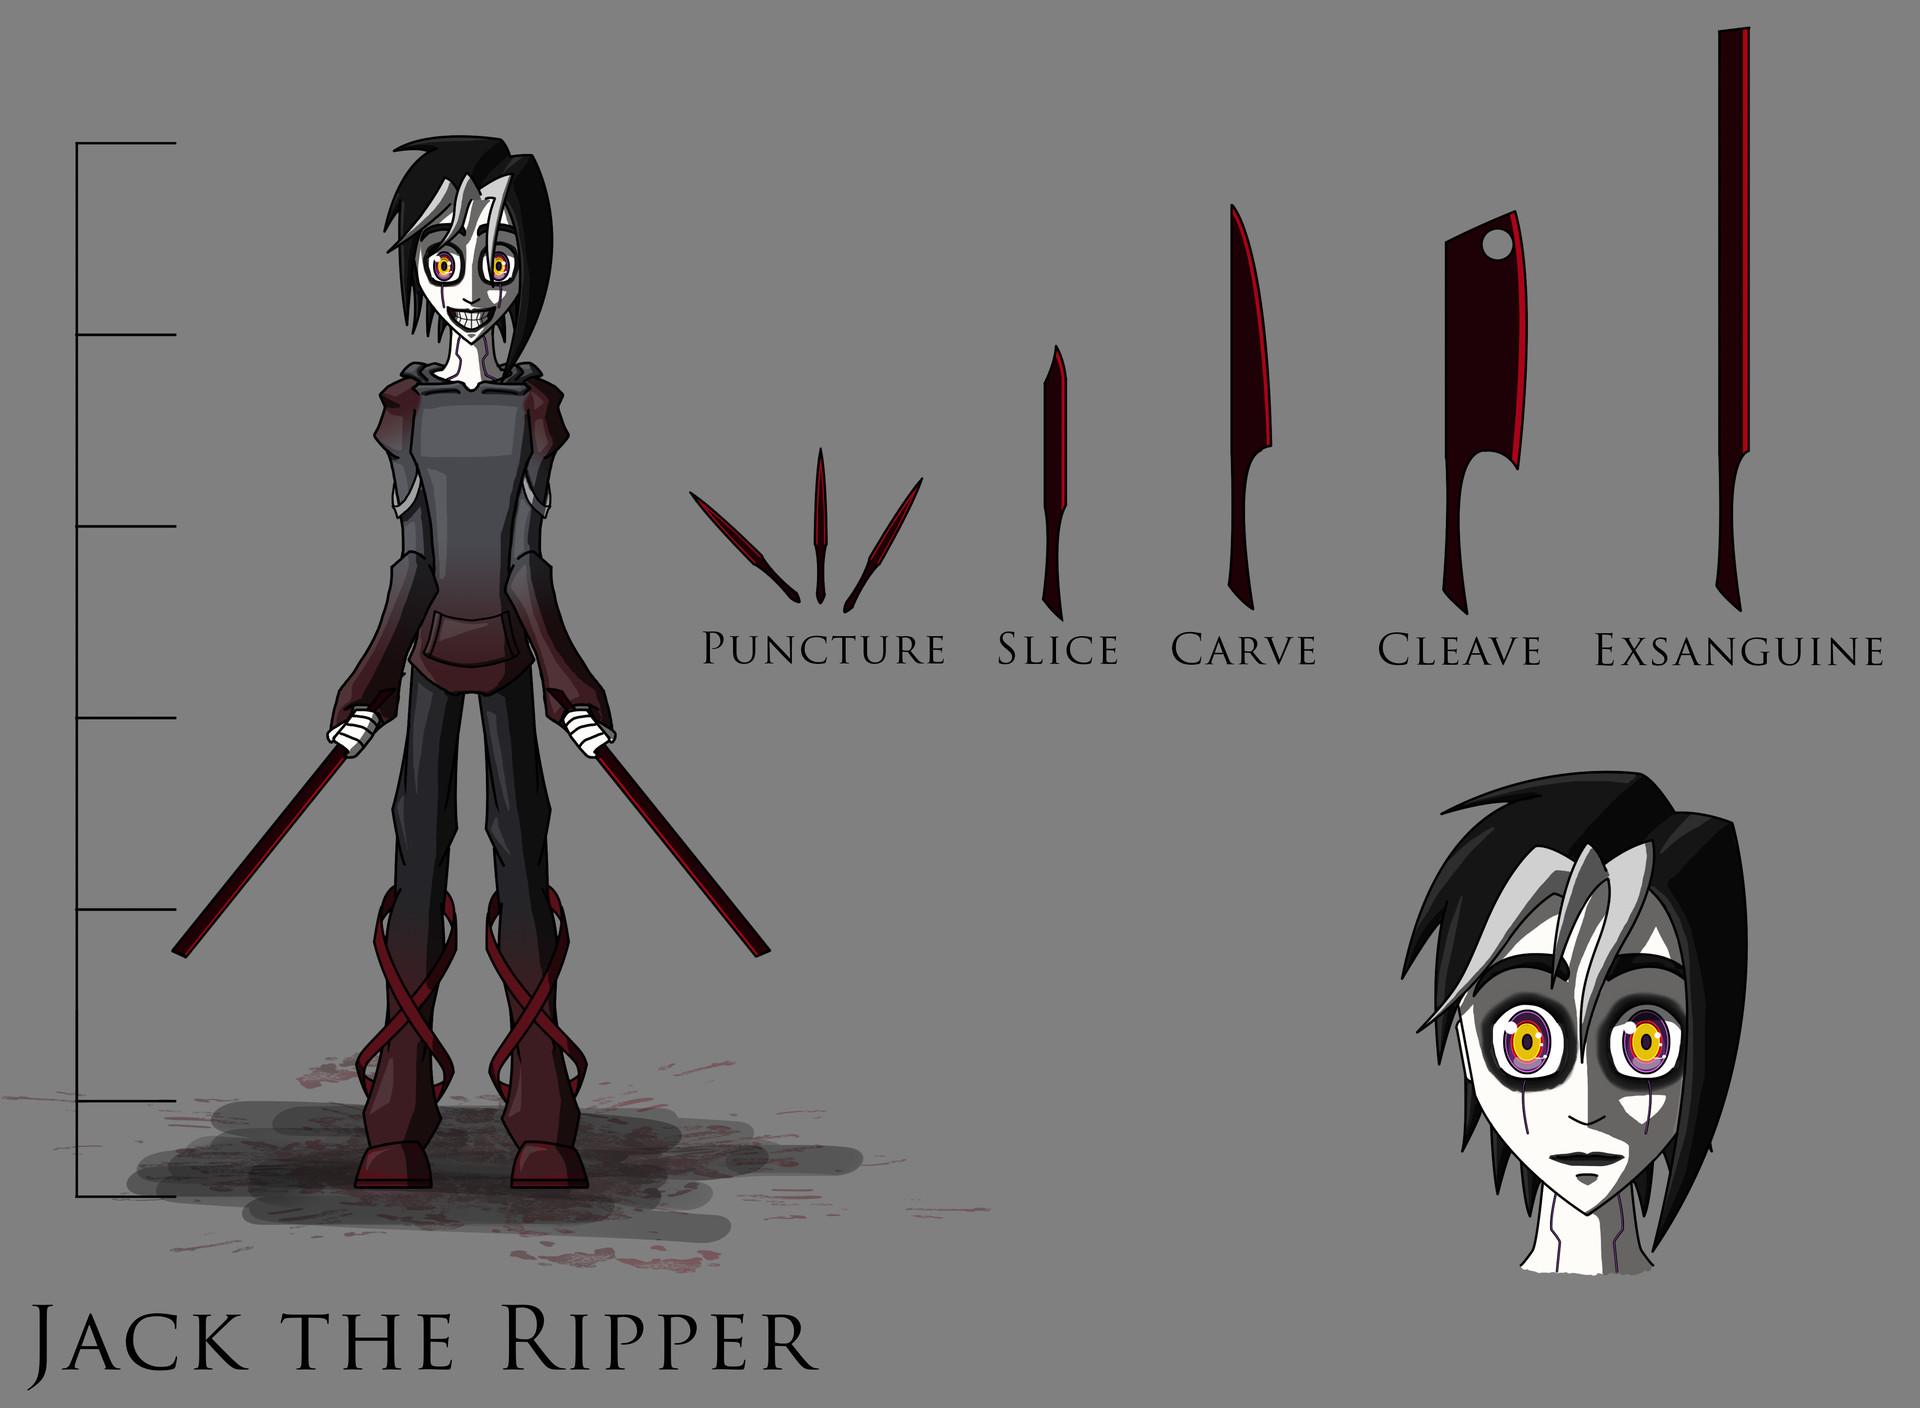 Kyle field jacktheripper charactersheet